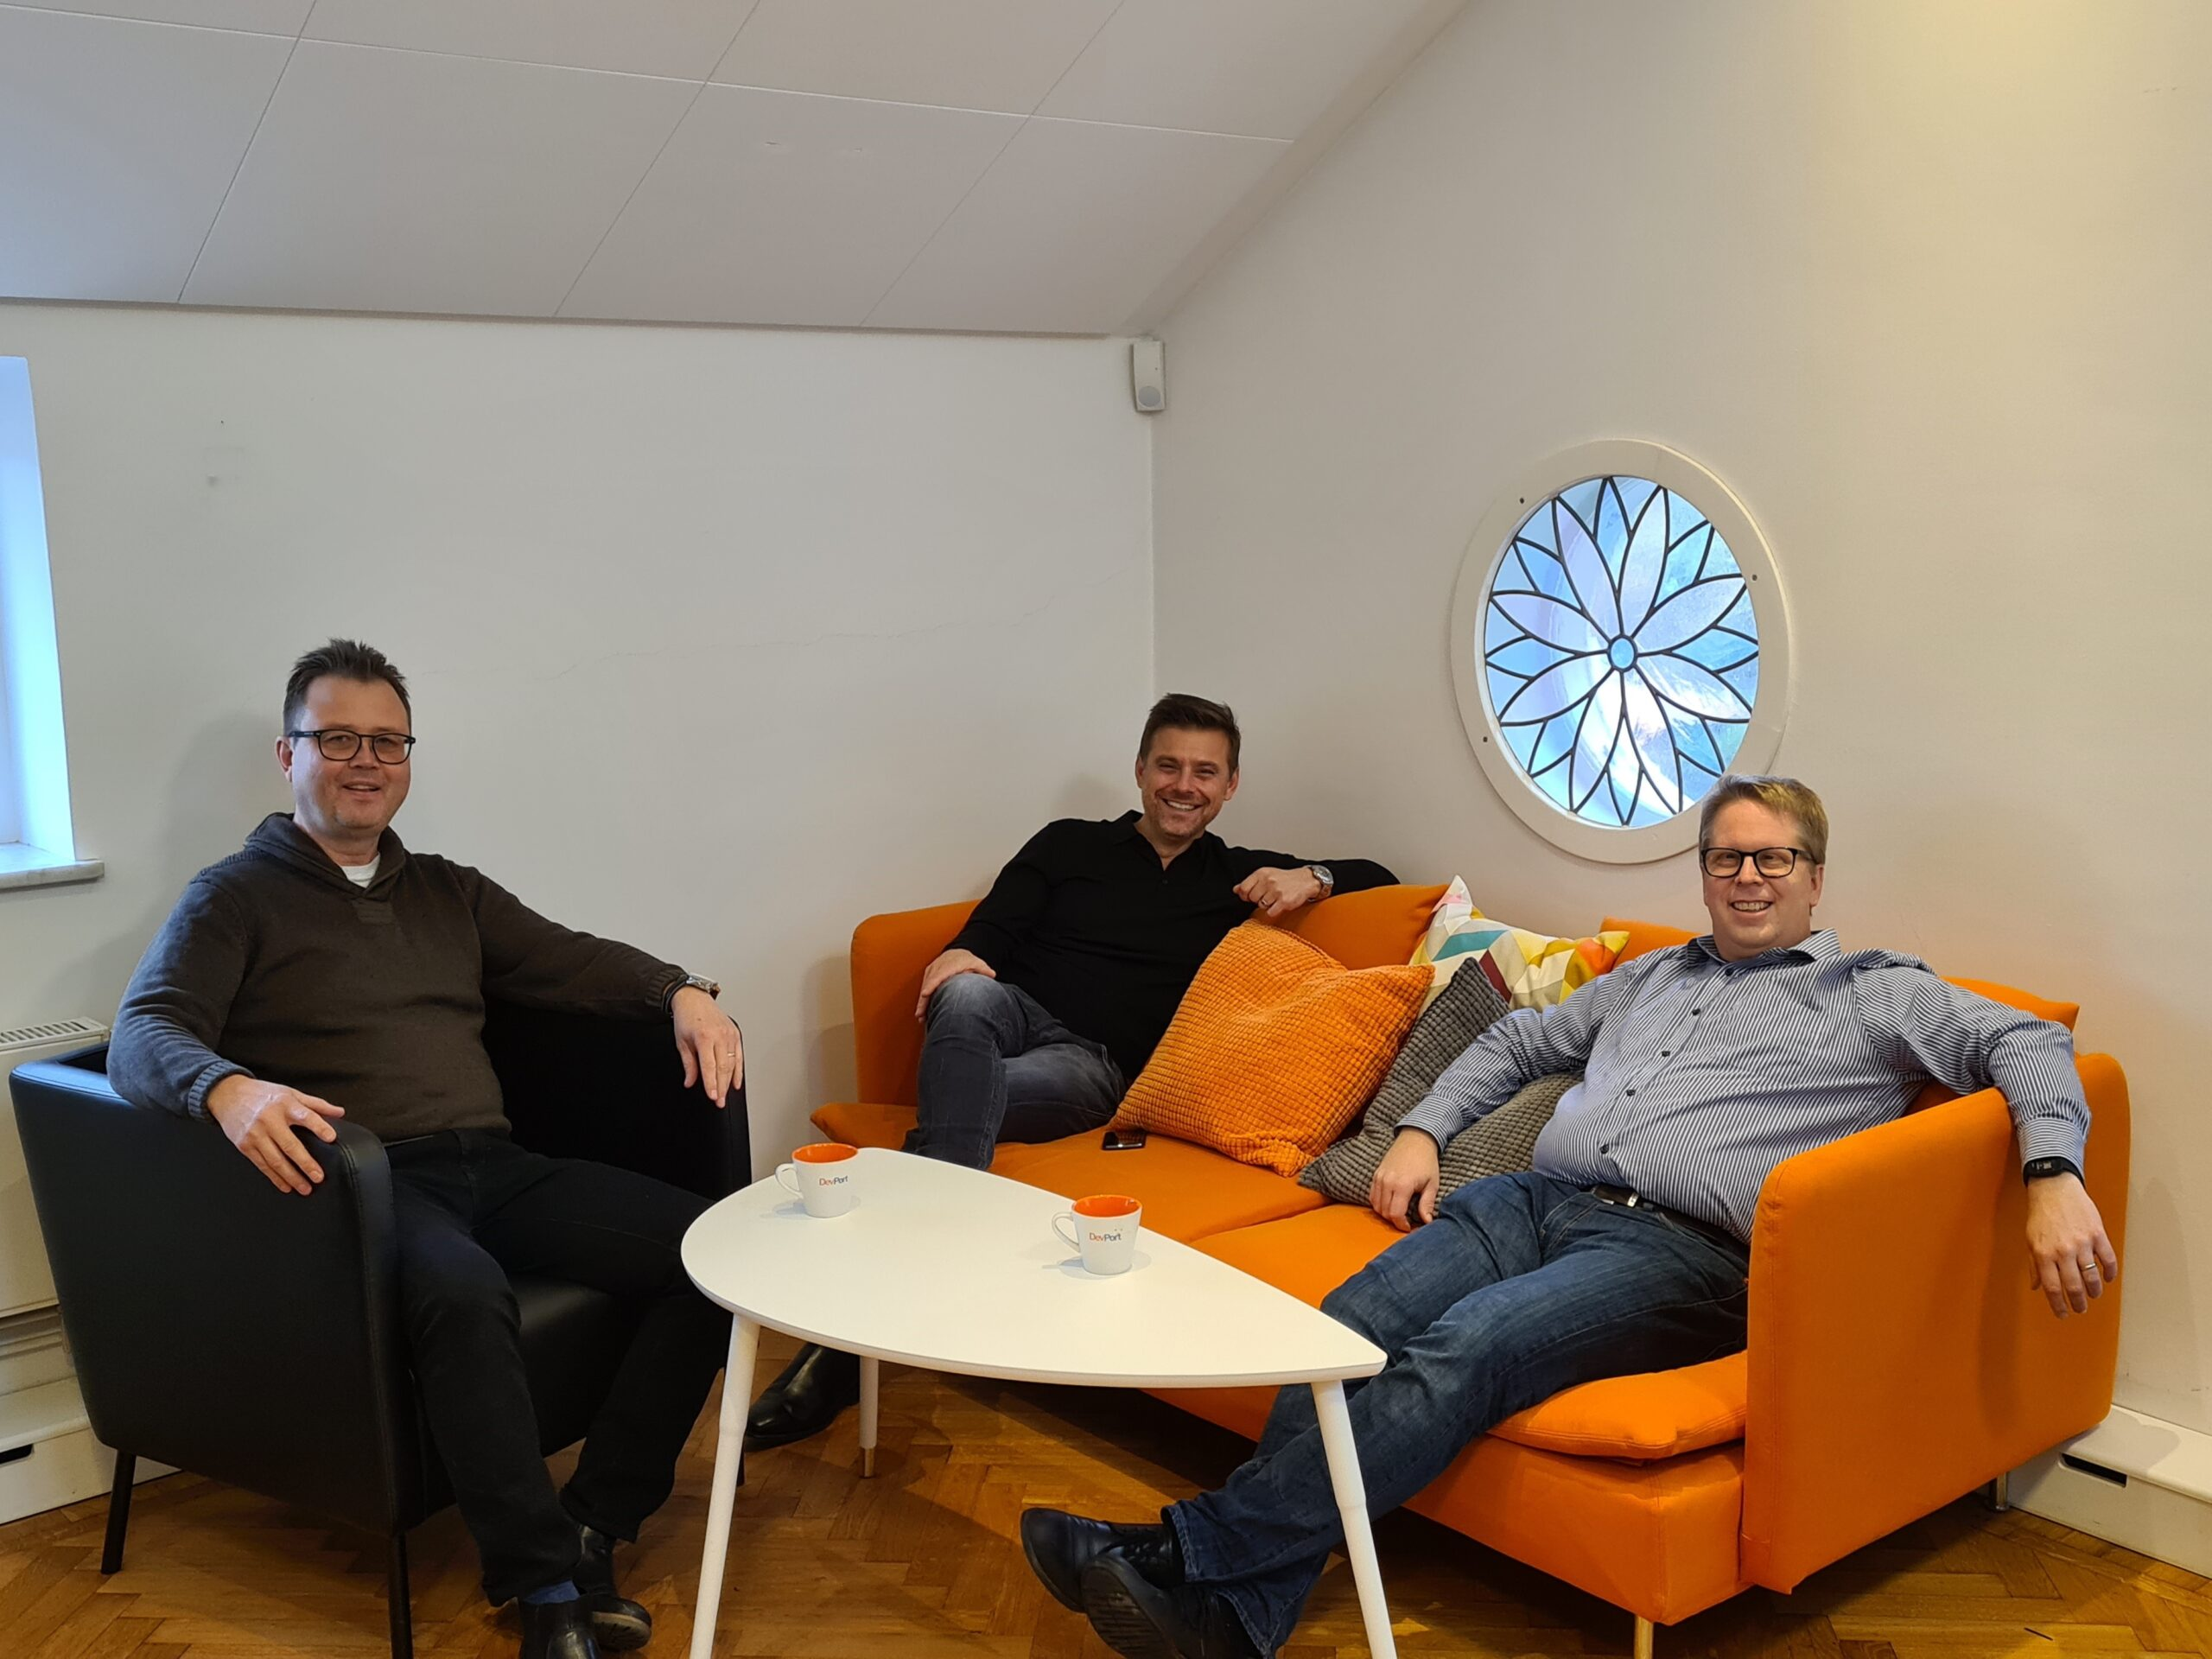 Vi expanderar i södra Sverige!